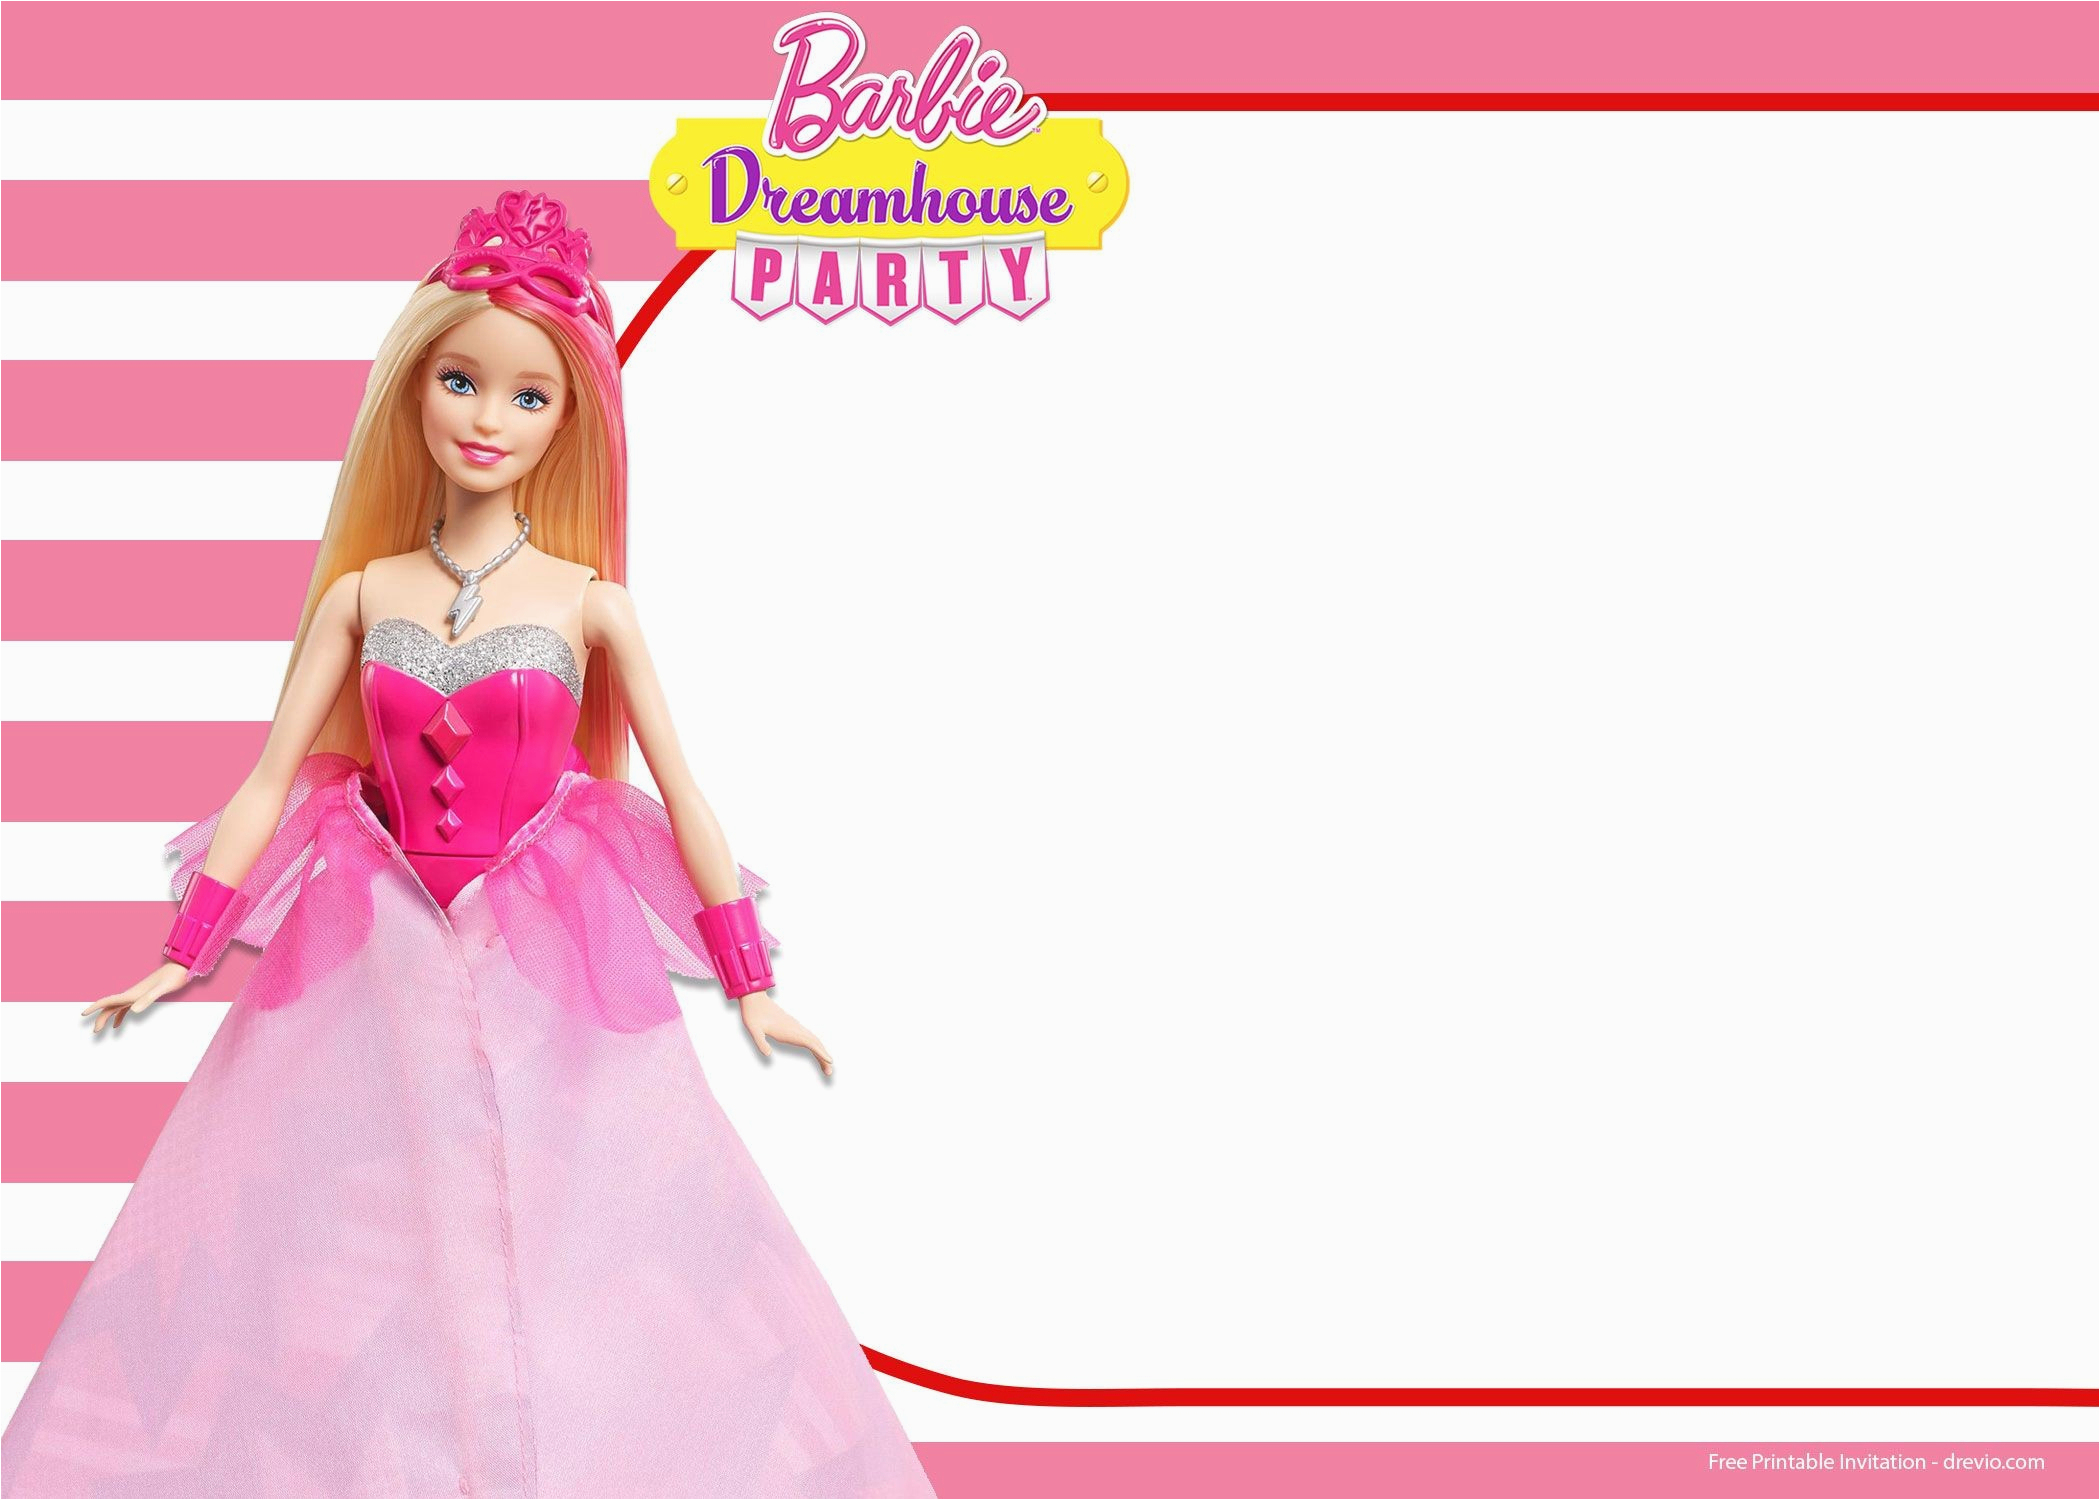 Barbie Birthday Invitation Card Free Printable Barbie Birthday Card - Free Printable Barbie Birthday Party Invitations